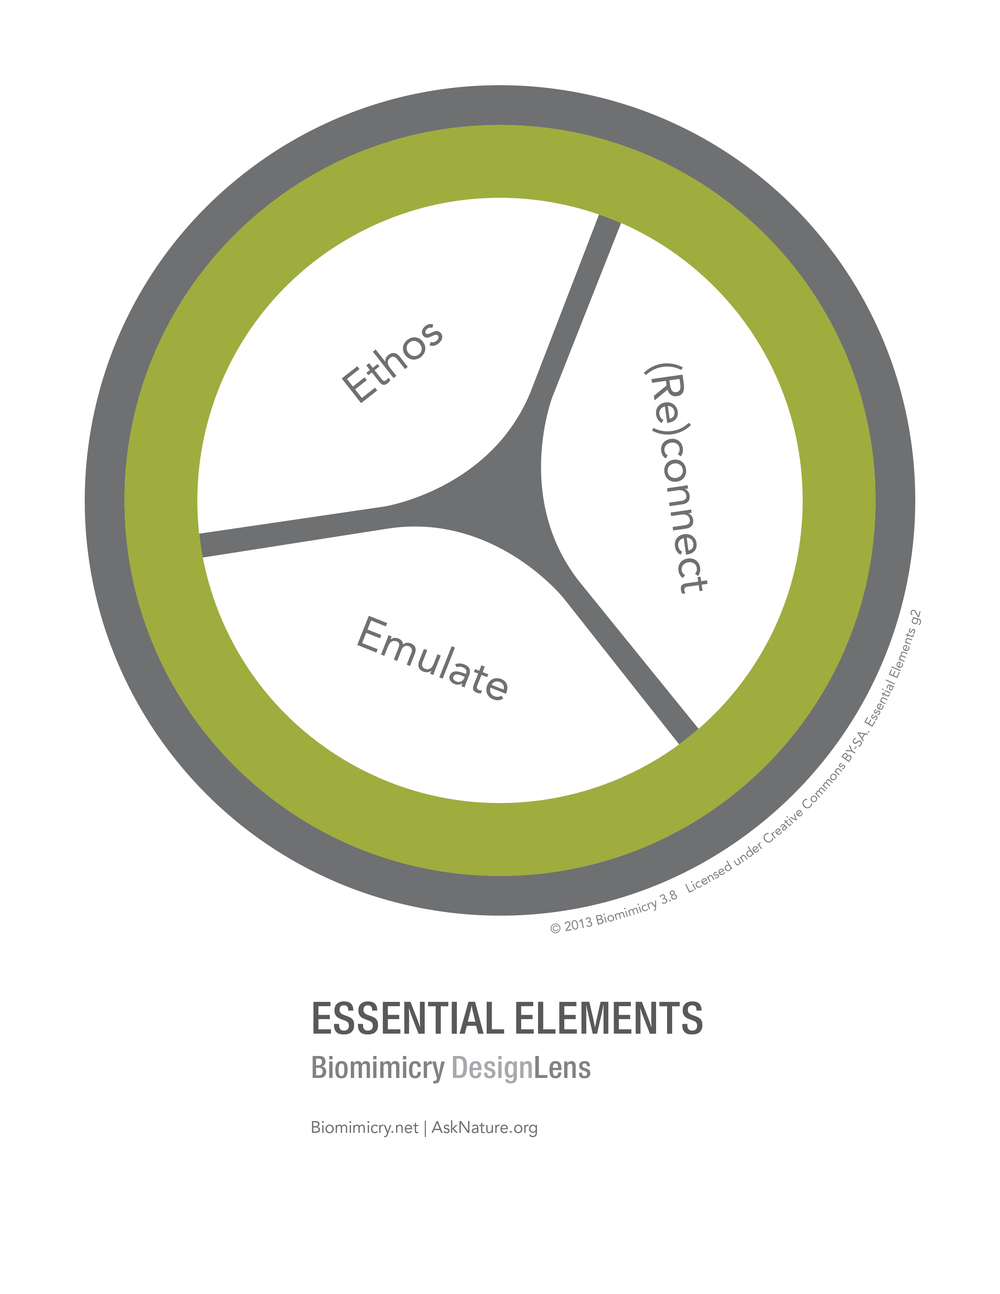 Biomimicry38_DesignLens_Essential_Elements_WEB.jpg